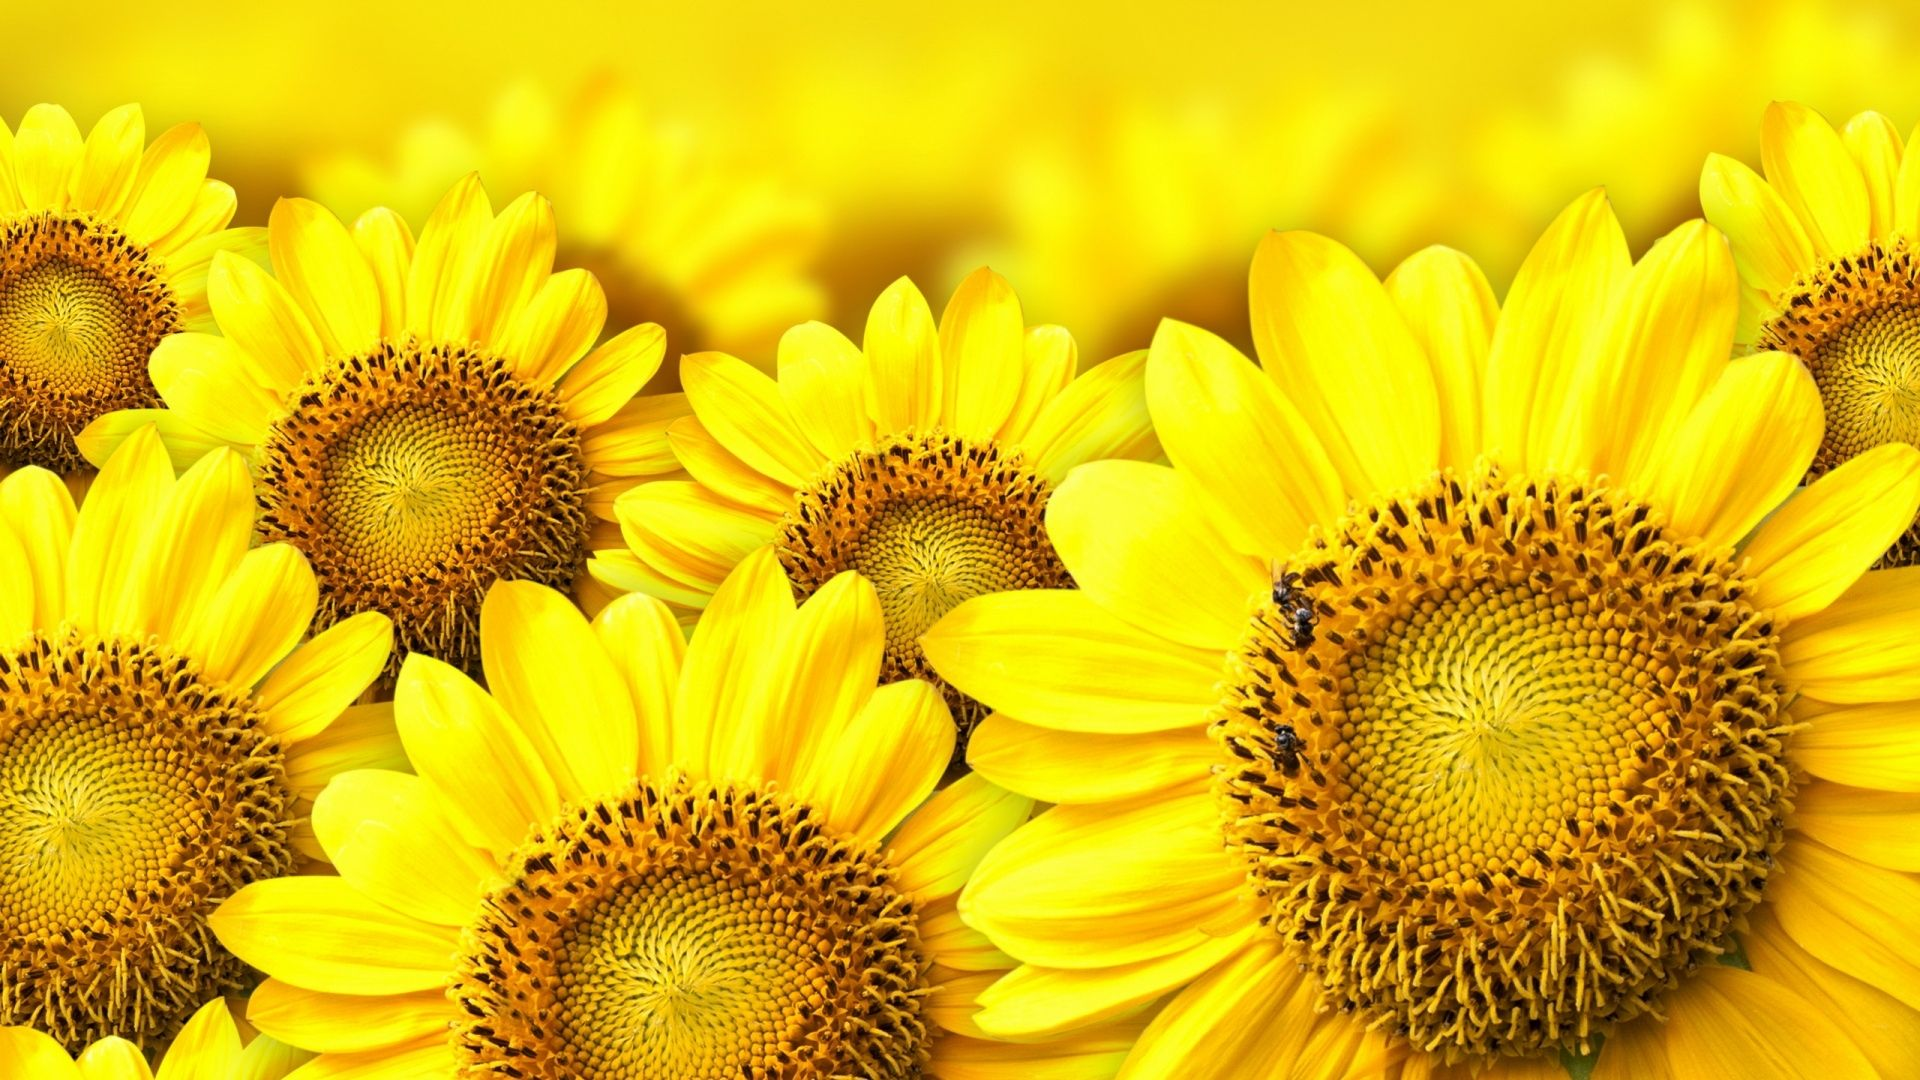 wallpapers sunflower